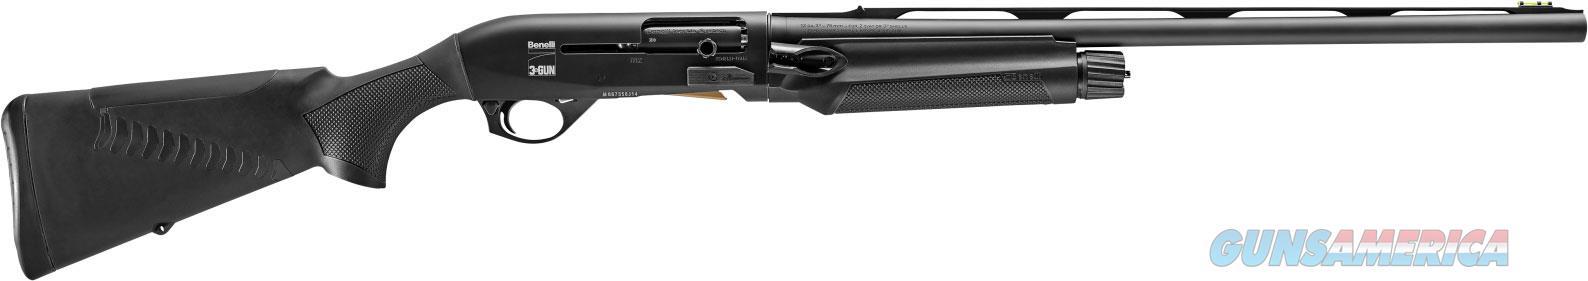 BENELLI M2 PERFORMANCE SHOP 3 GUN NIB FREE SHIPPING  Guns > Shotguns > Benelli Shotguns > Tactical